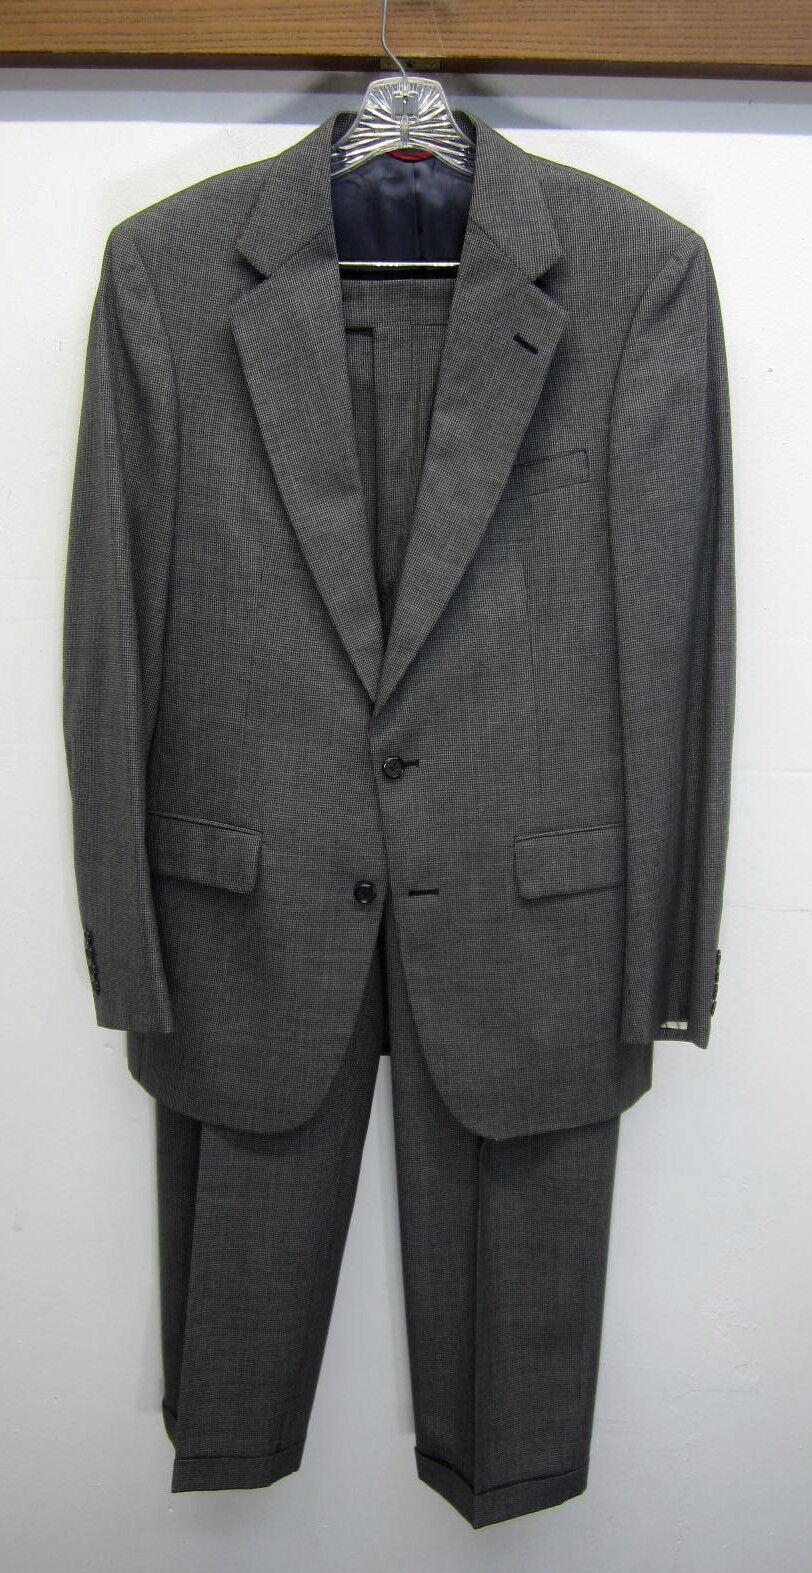 Vtg Jos A Bank Executive Collection Suit Blazer & Pants houndstooth sz 39L 34x31